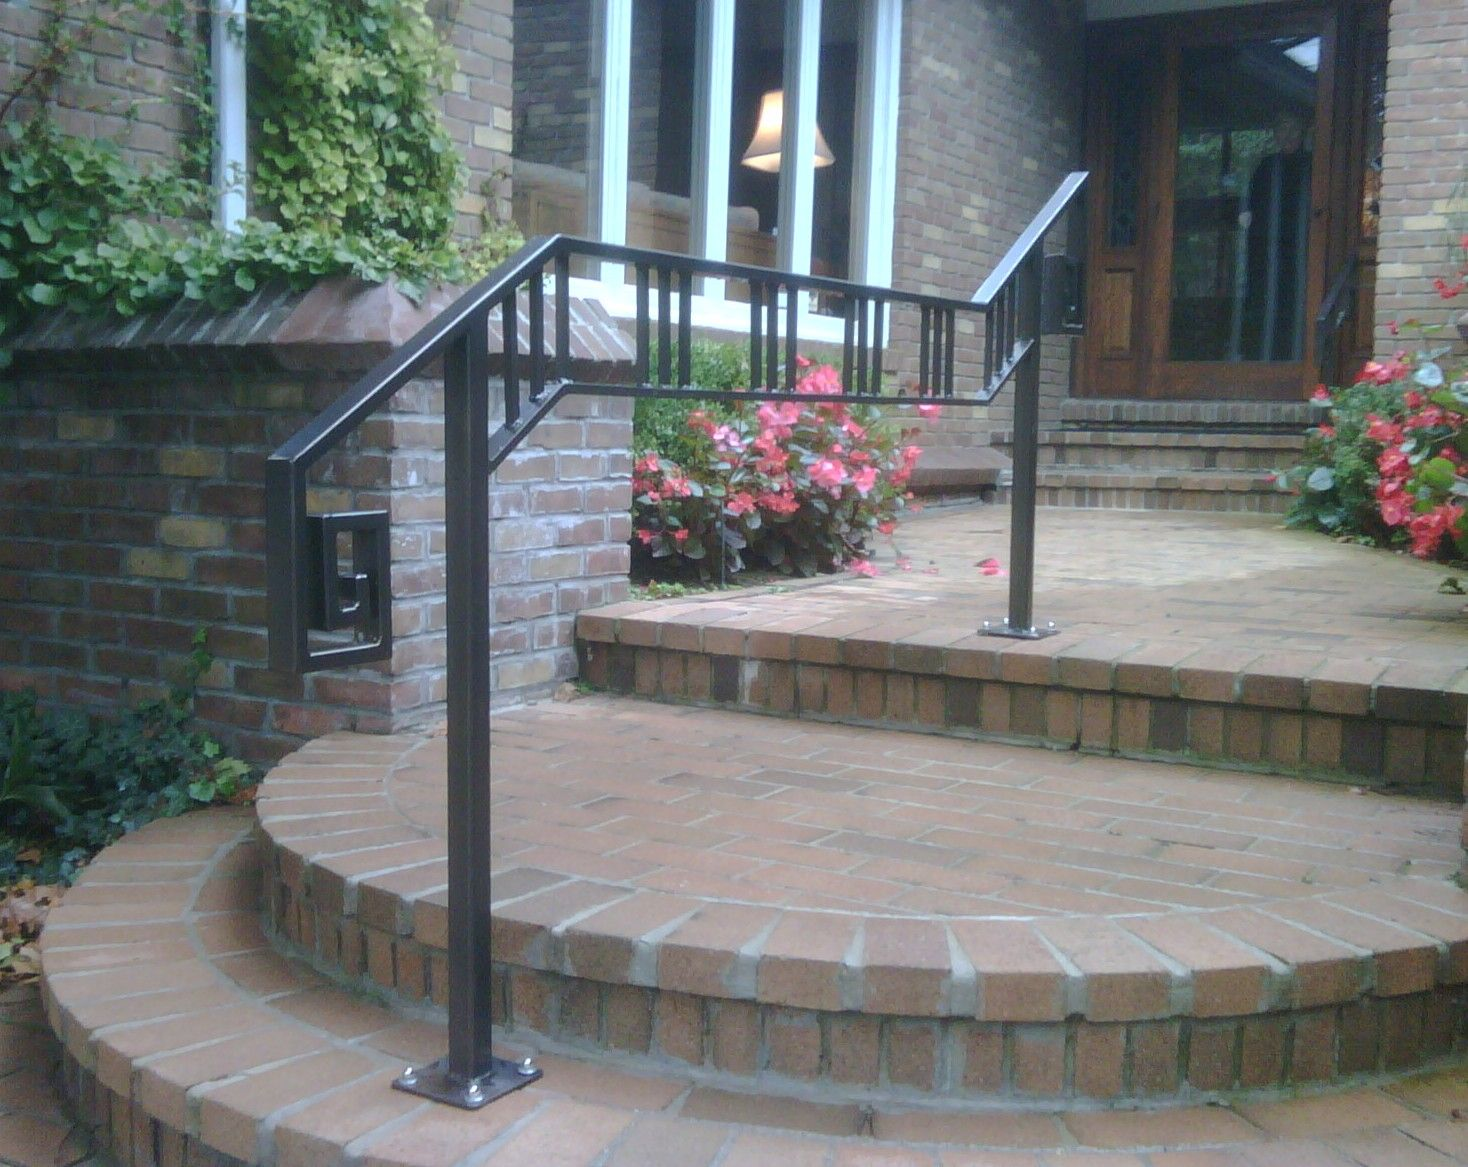 Wrought Iron Or Aluminum Railings Google Search | Aluminum Handrails For Steps